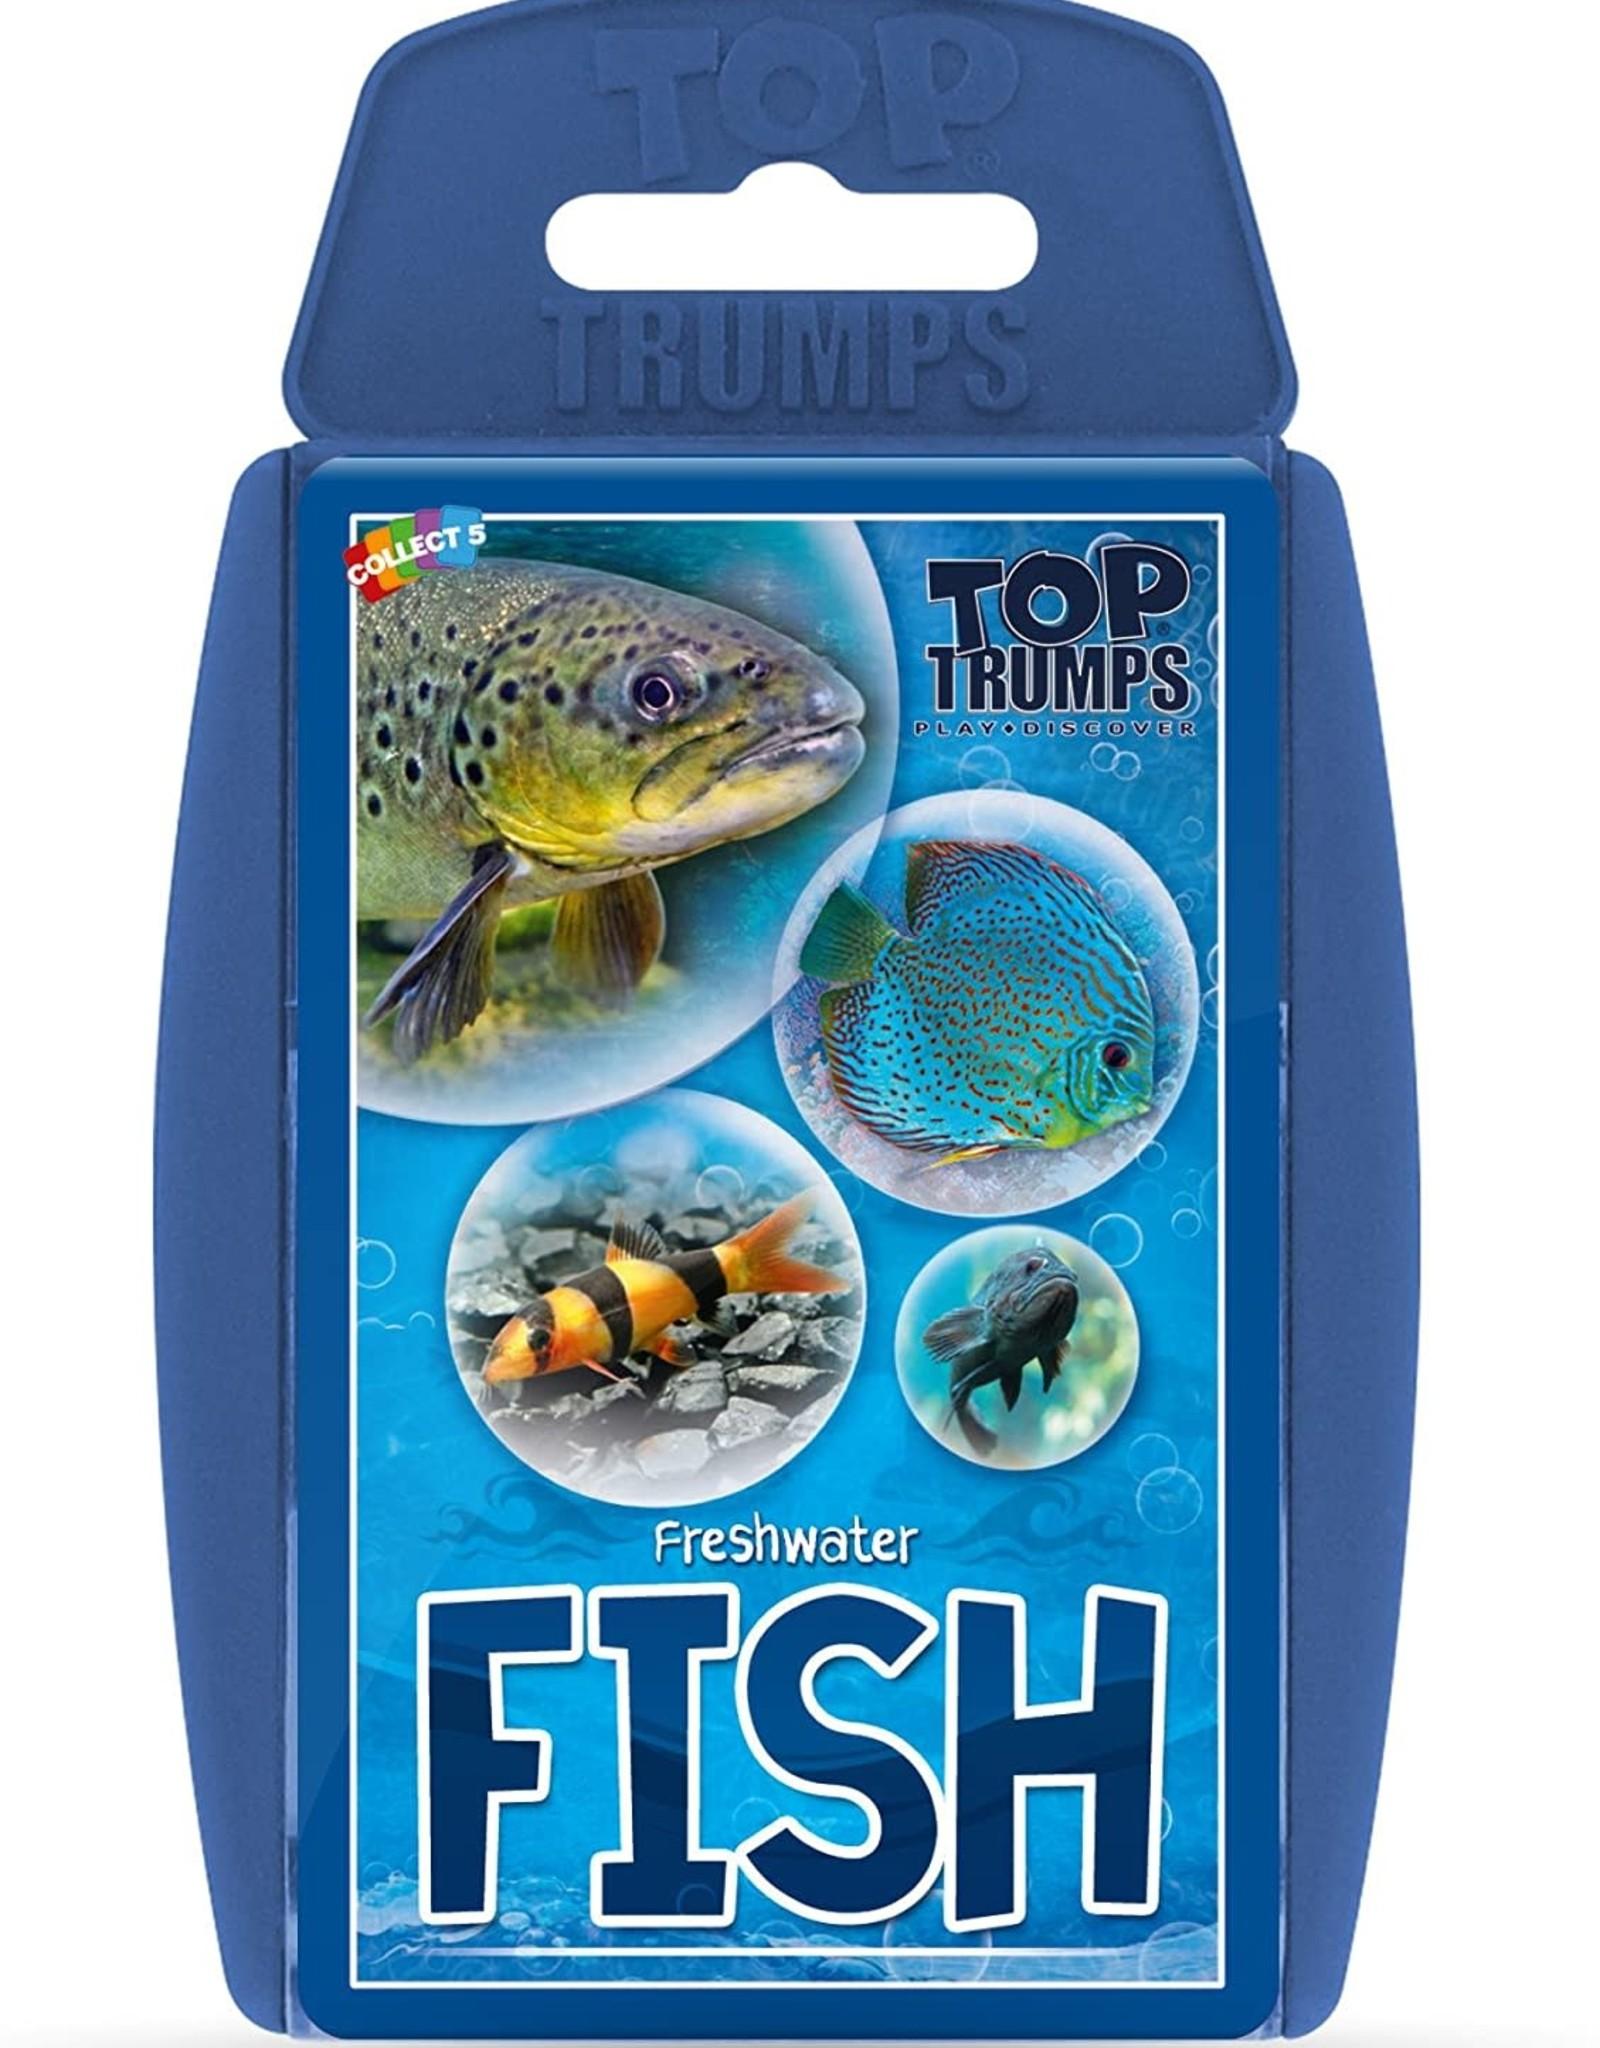 Top Trumps Top Trumps: Freshwater Fish